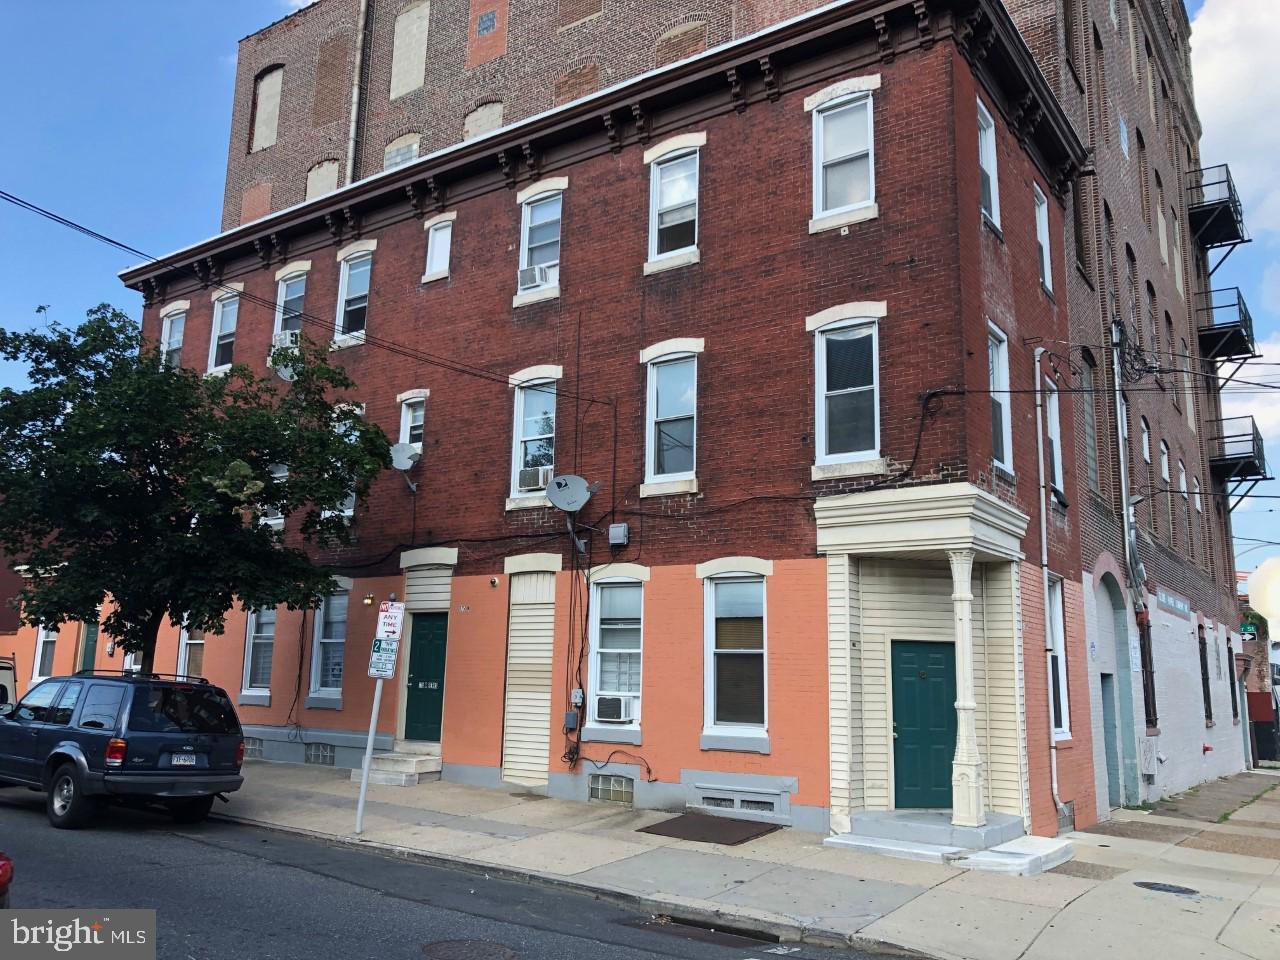 175 W BERKS STREET, PHILADELPHIA, PA 19122